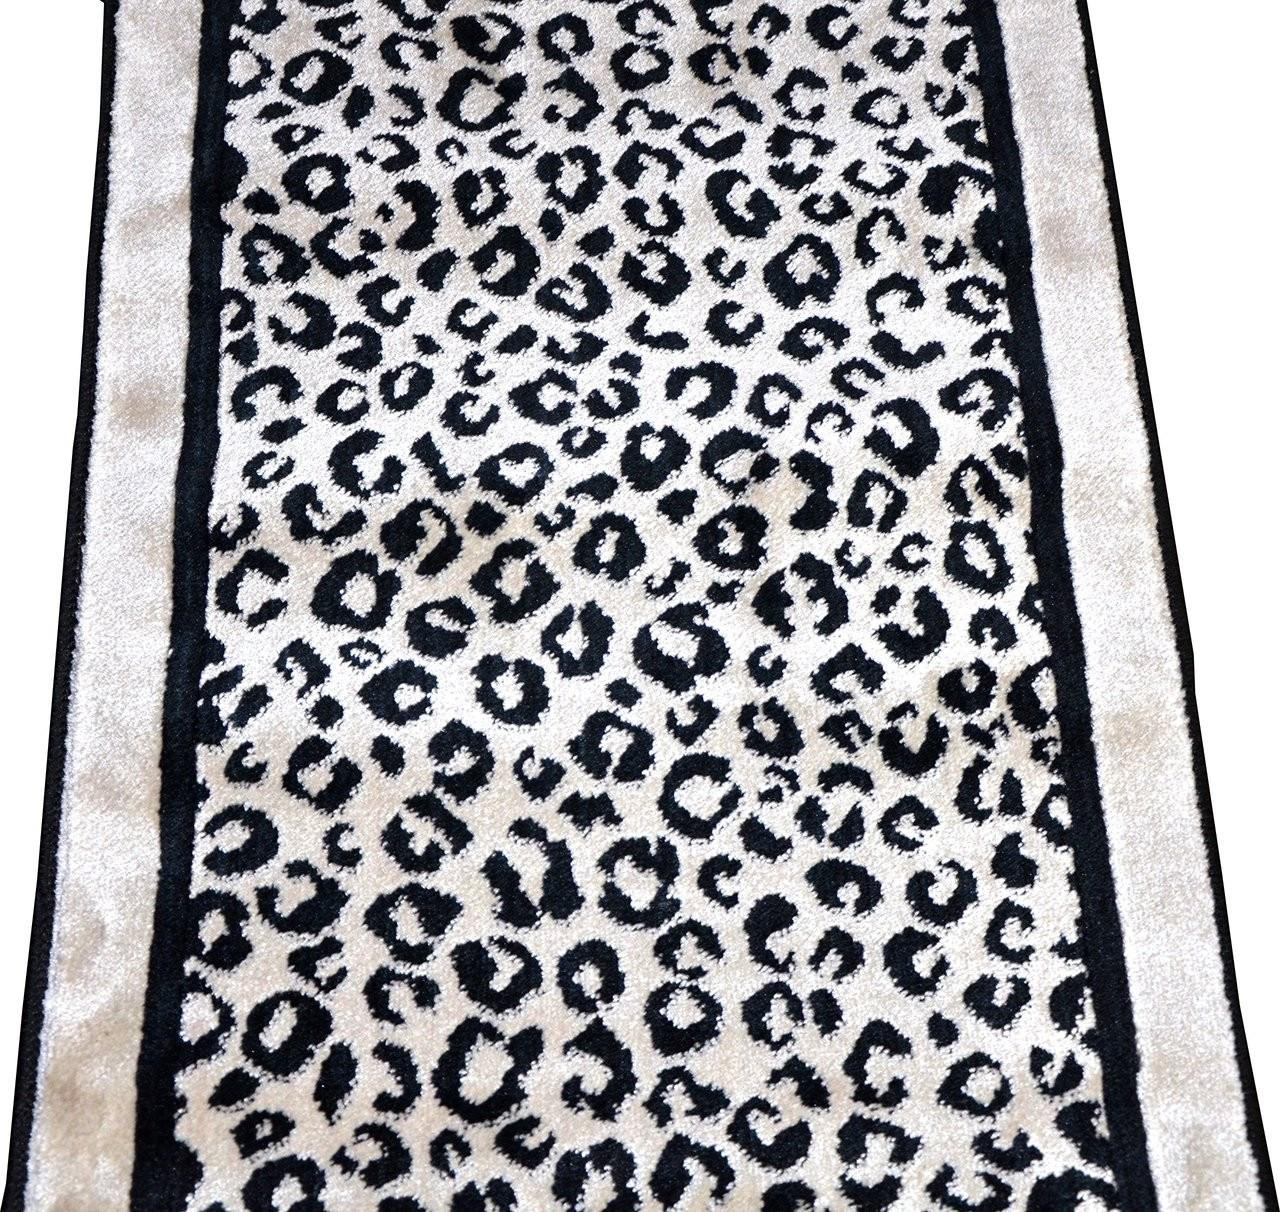 Kenya Onyx Snow Leopard Stair Or Hall Premium Nylon Carpet Runner   Carpet Runners Sold By The Foot   Wooden Stair   Coastal Carpet   Laminate   Grey   Wedding